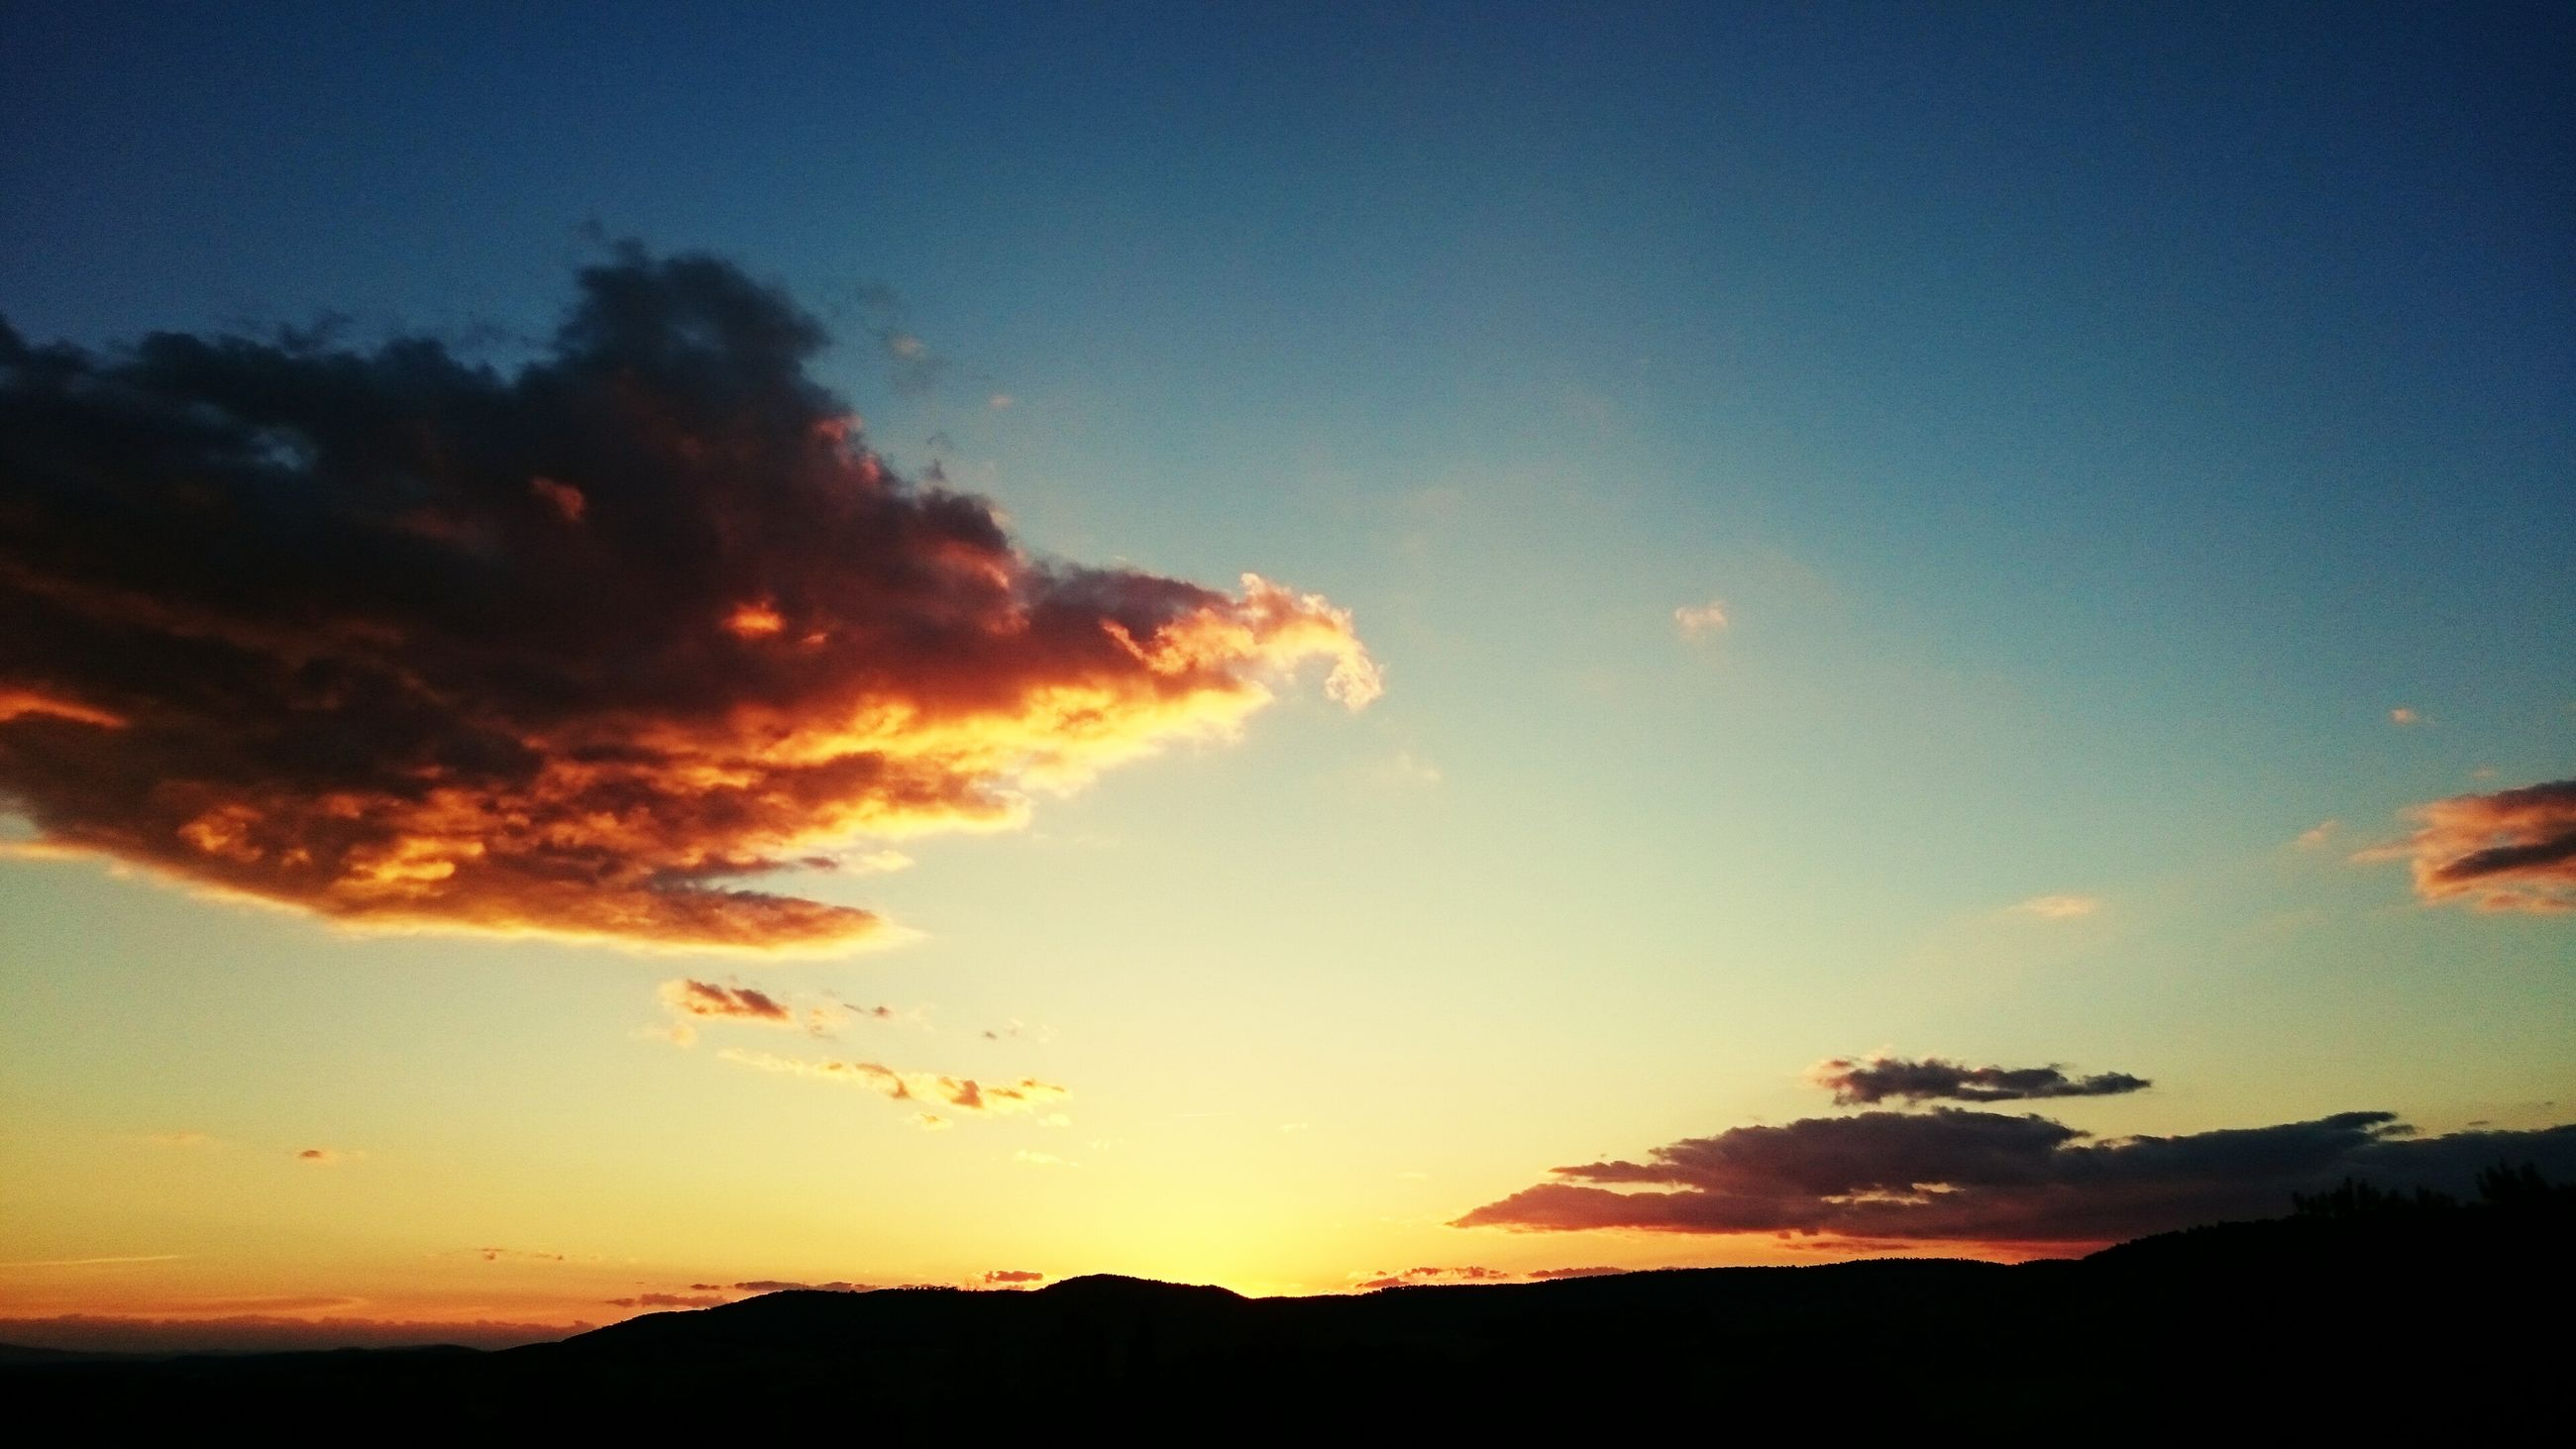 sunset, silhouette, tranquil scene, scenics, tranquility, beauty in nature, sky, orange color, nature, idyllic, landscape, blue, cloud - sky, cloud, outdoors, majestic, no people, non-urban scene, dusk, sunlight